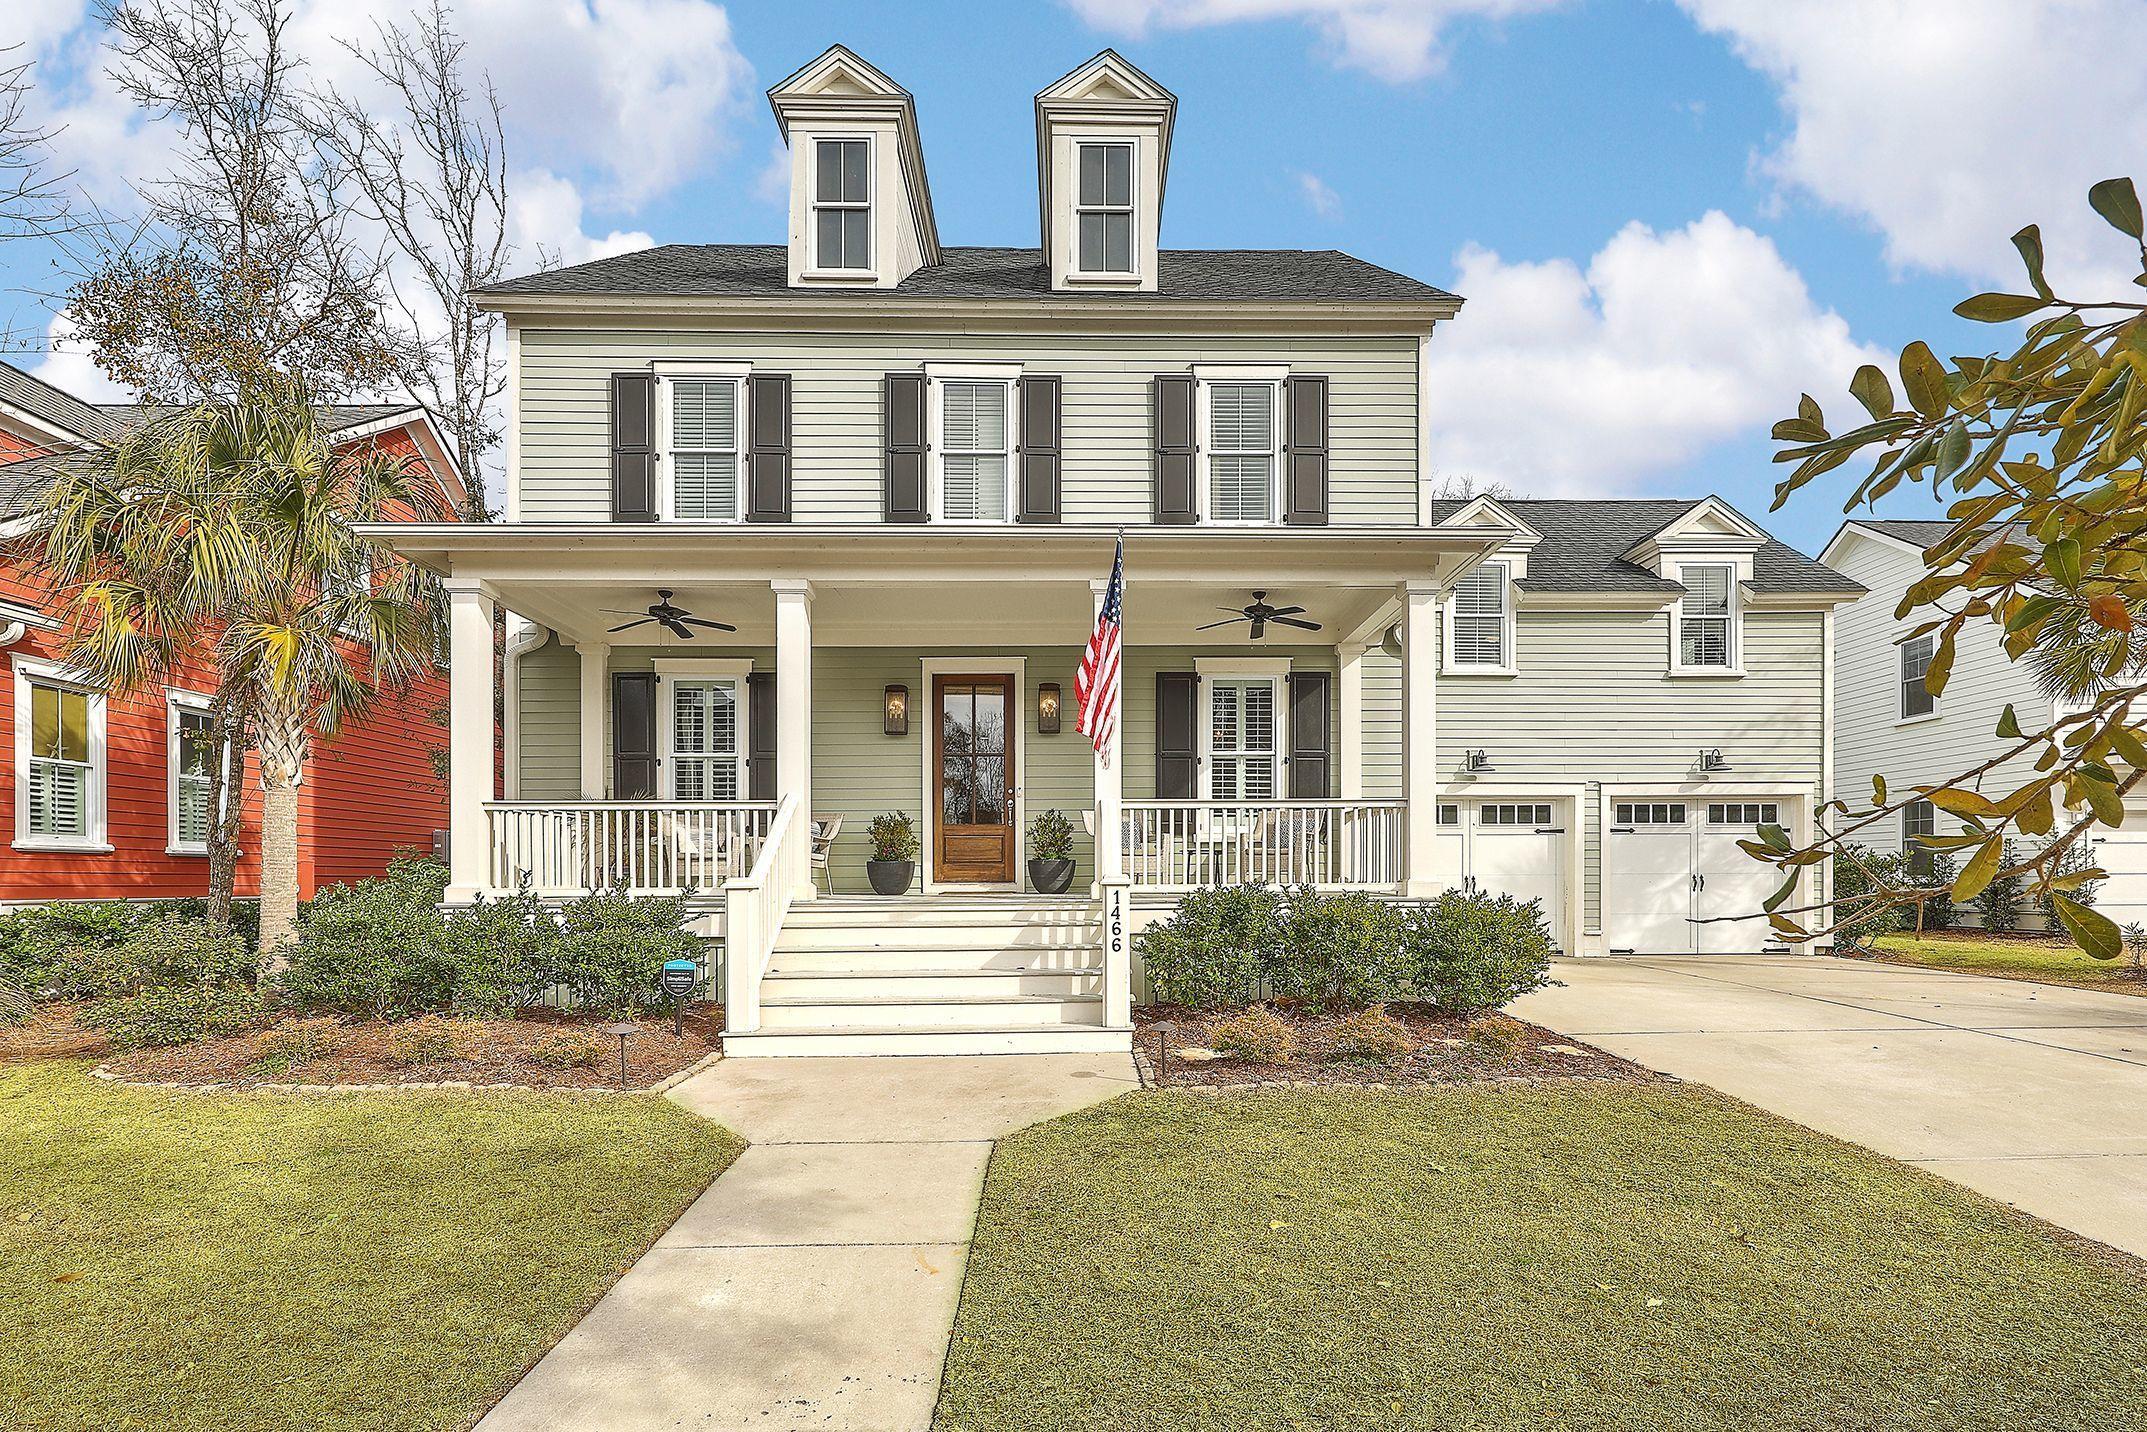 Carolina Park Homes For Sale - 1466 Gunnison, Mount Pleasant, SC - 1